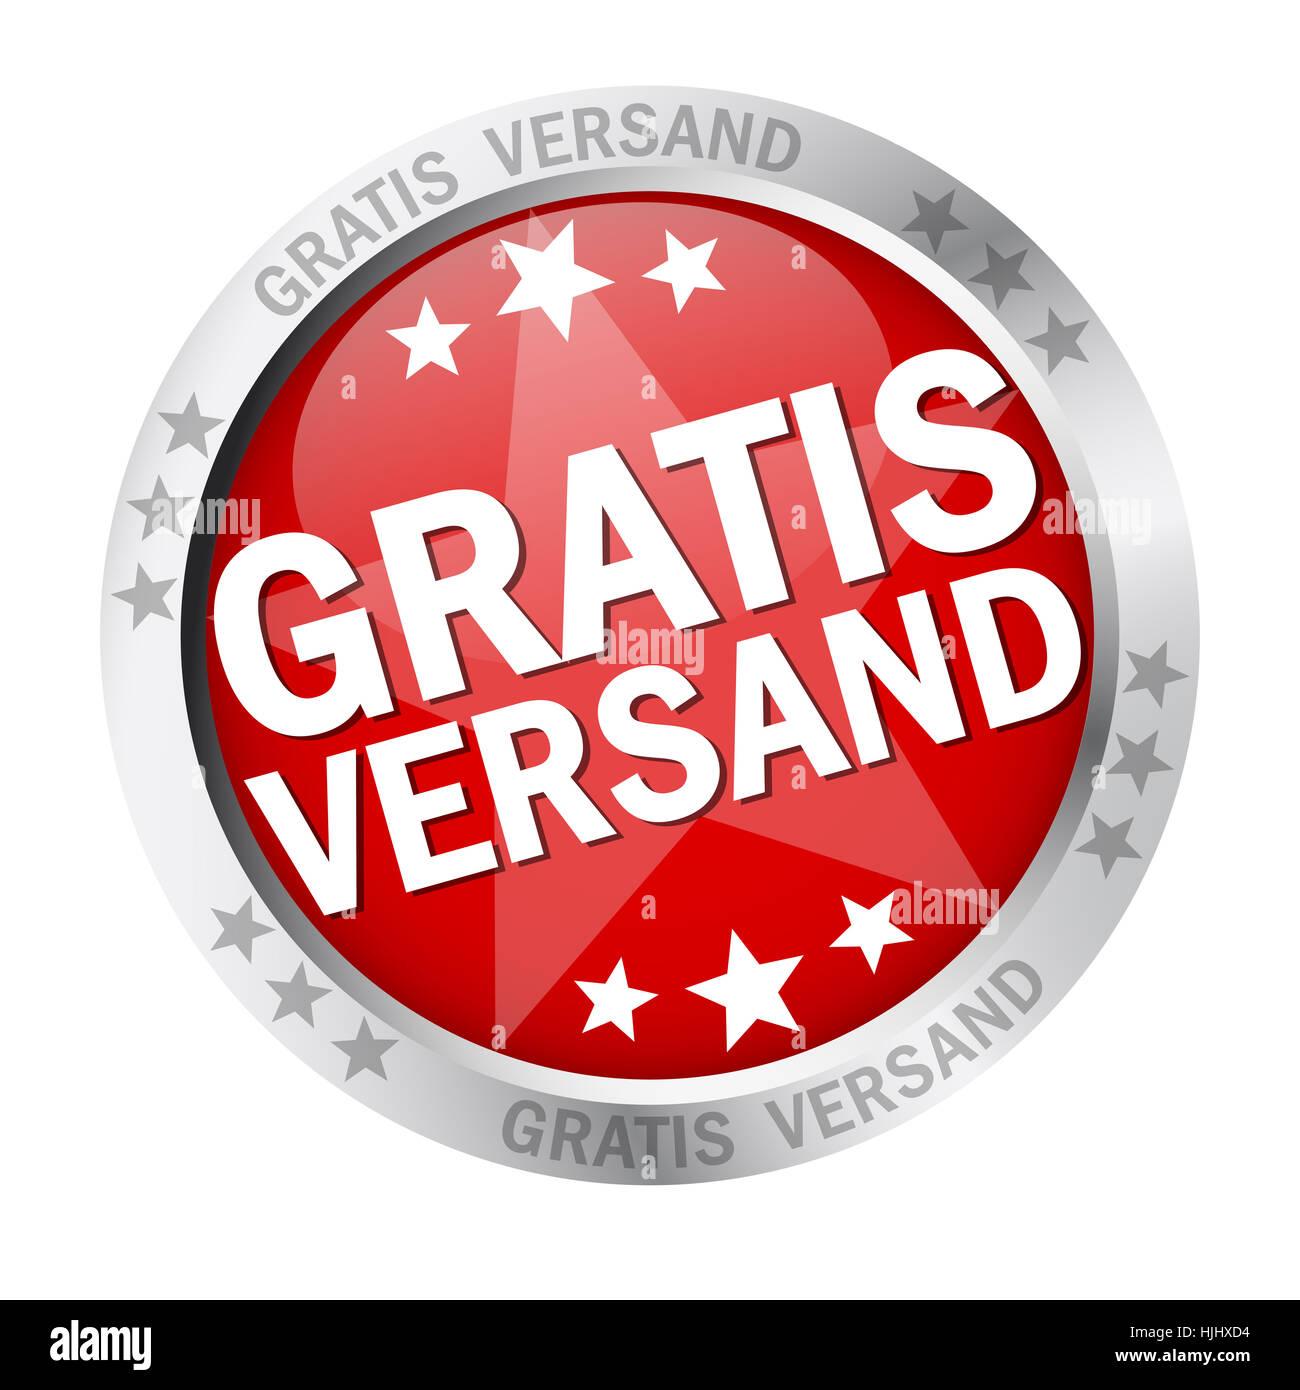 order, service, dispatch, achievement, transport, business dealings, deal, Stock Photo